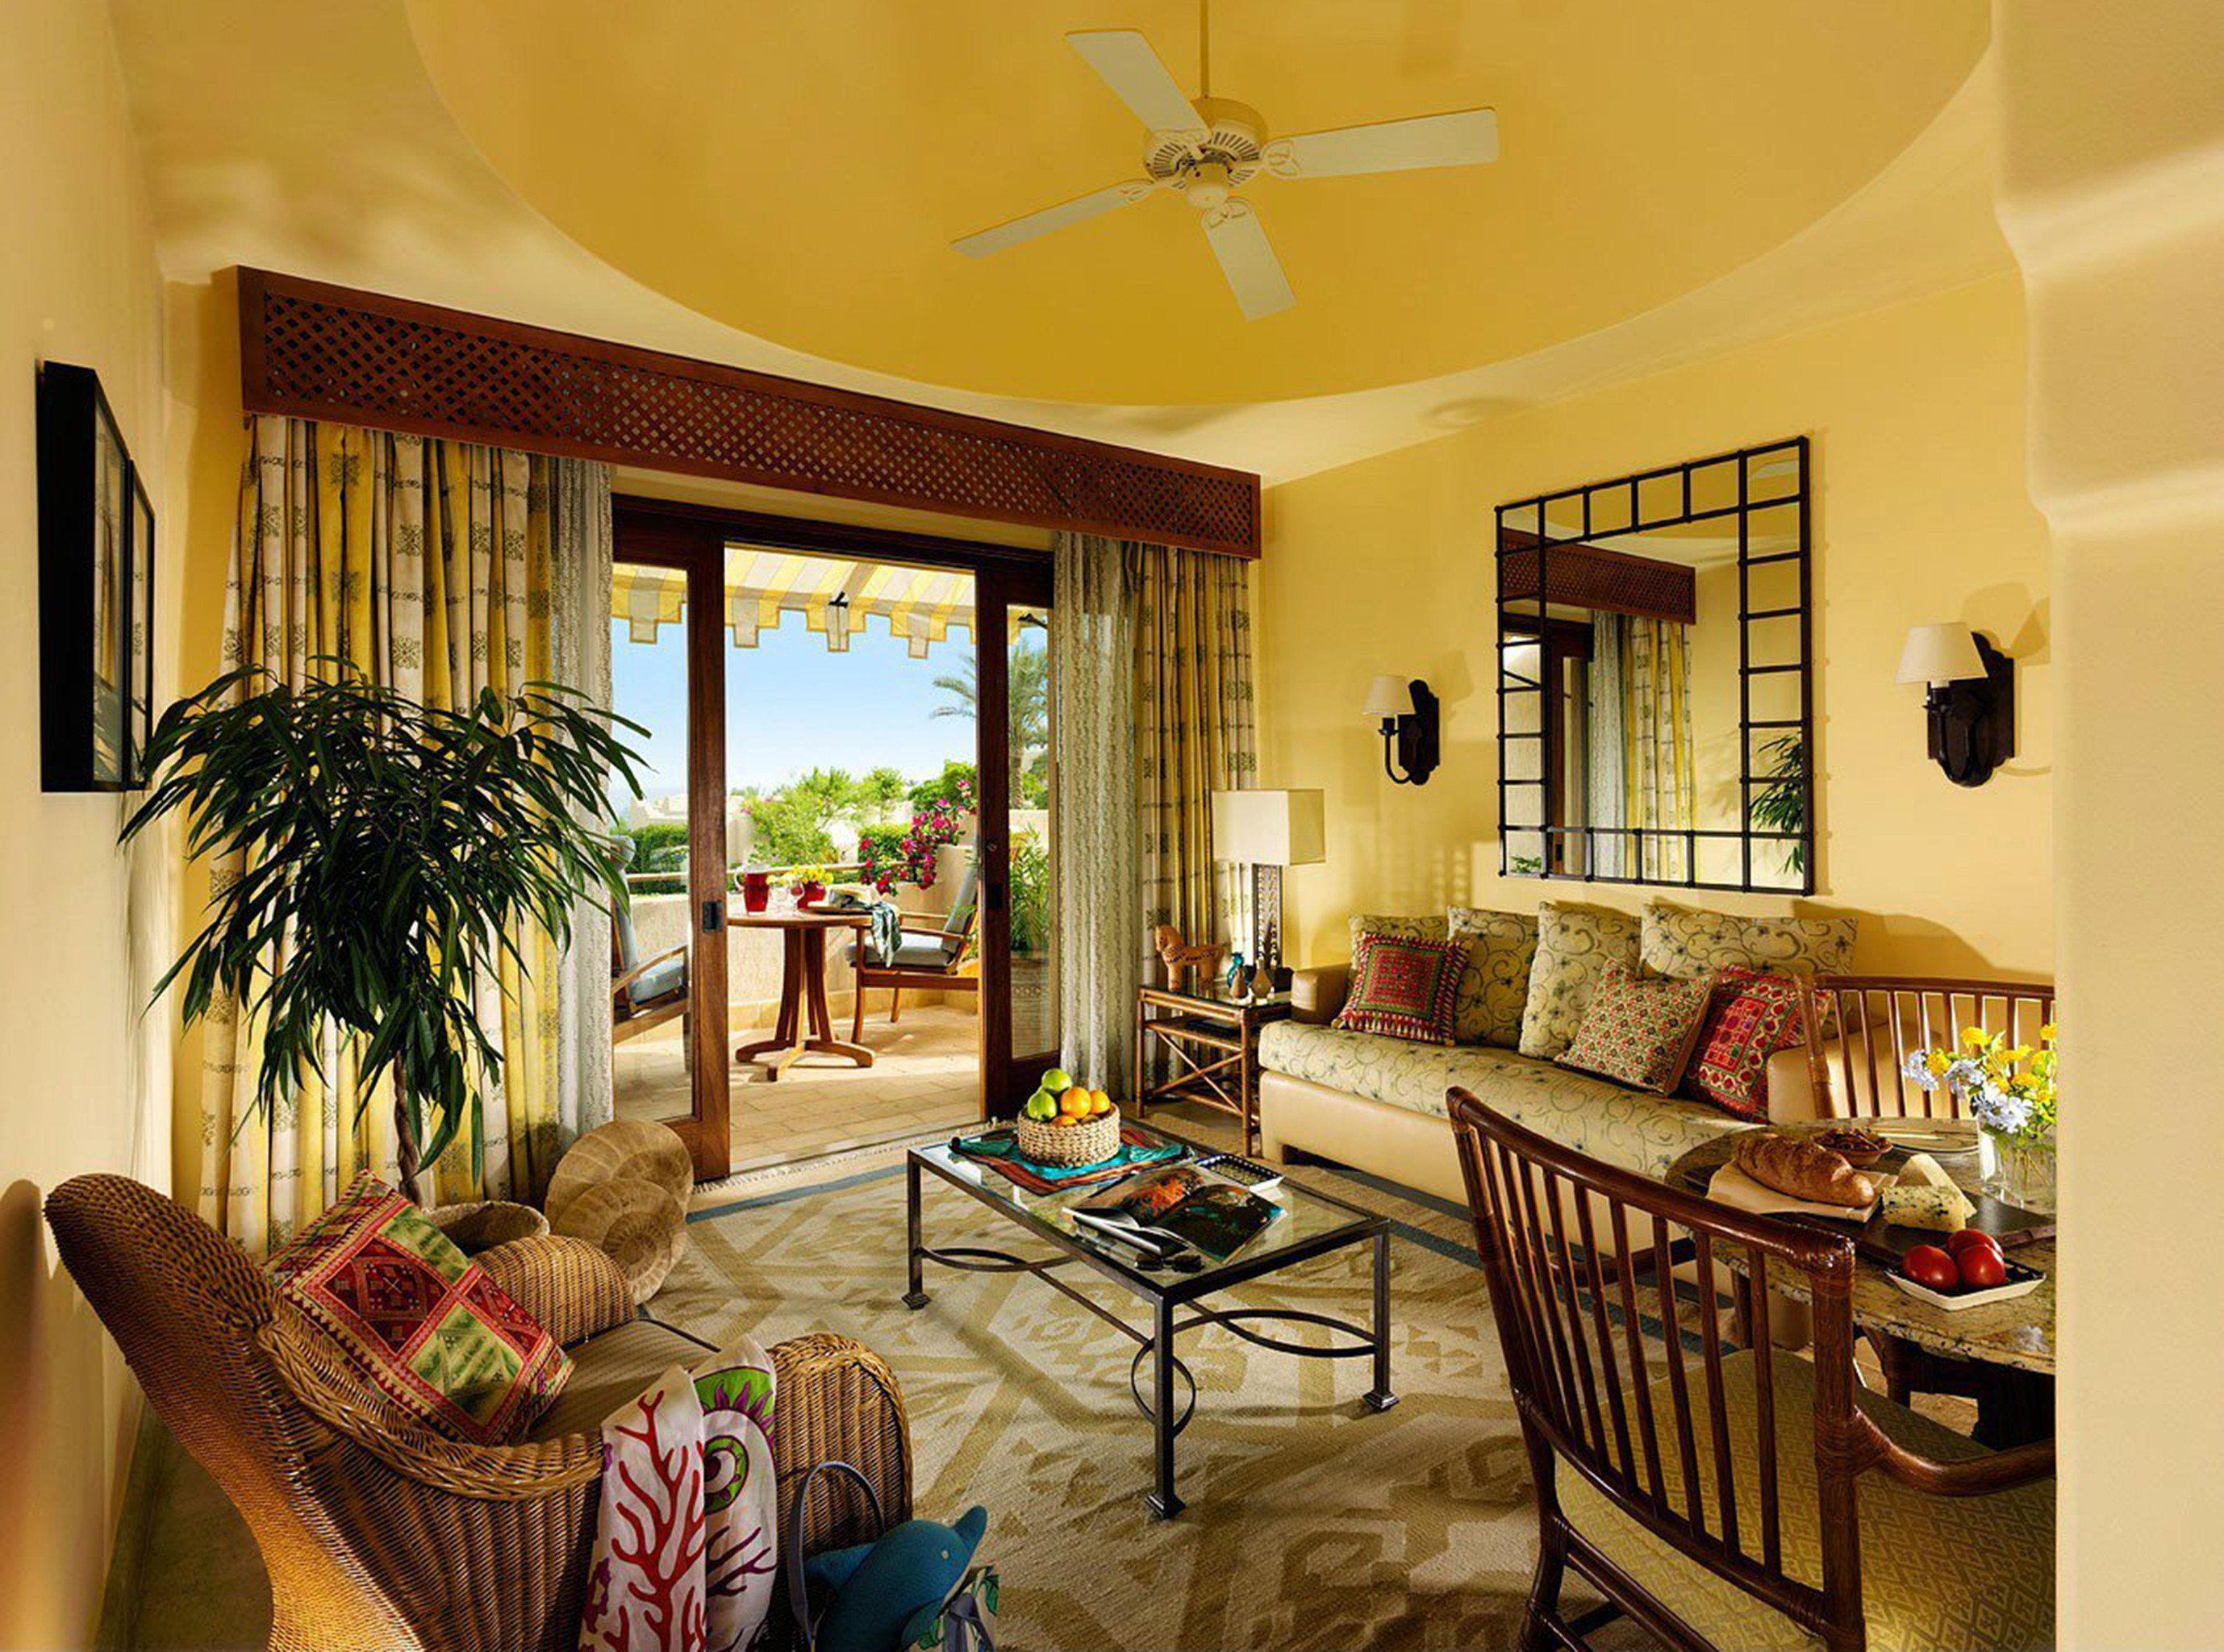 Bedroom Classic Elegant Scenic views Suite property living room home house Villa hardwood condominium farmhouse cottage mansion Resort